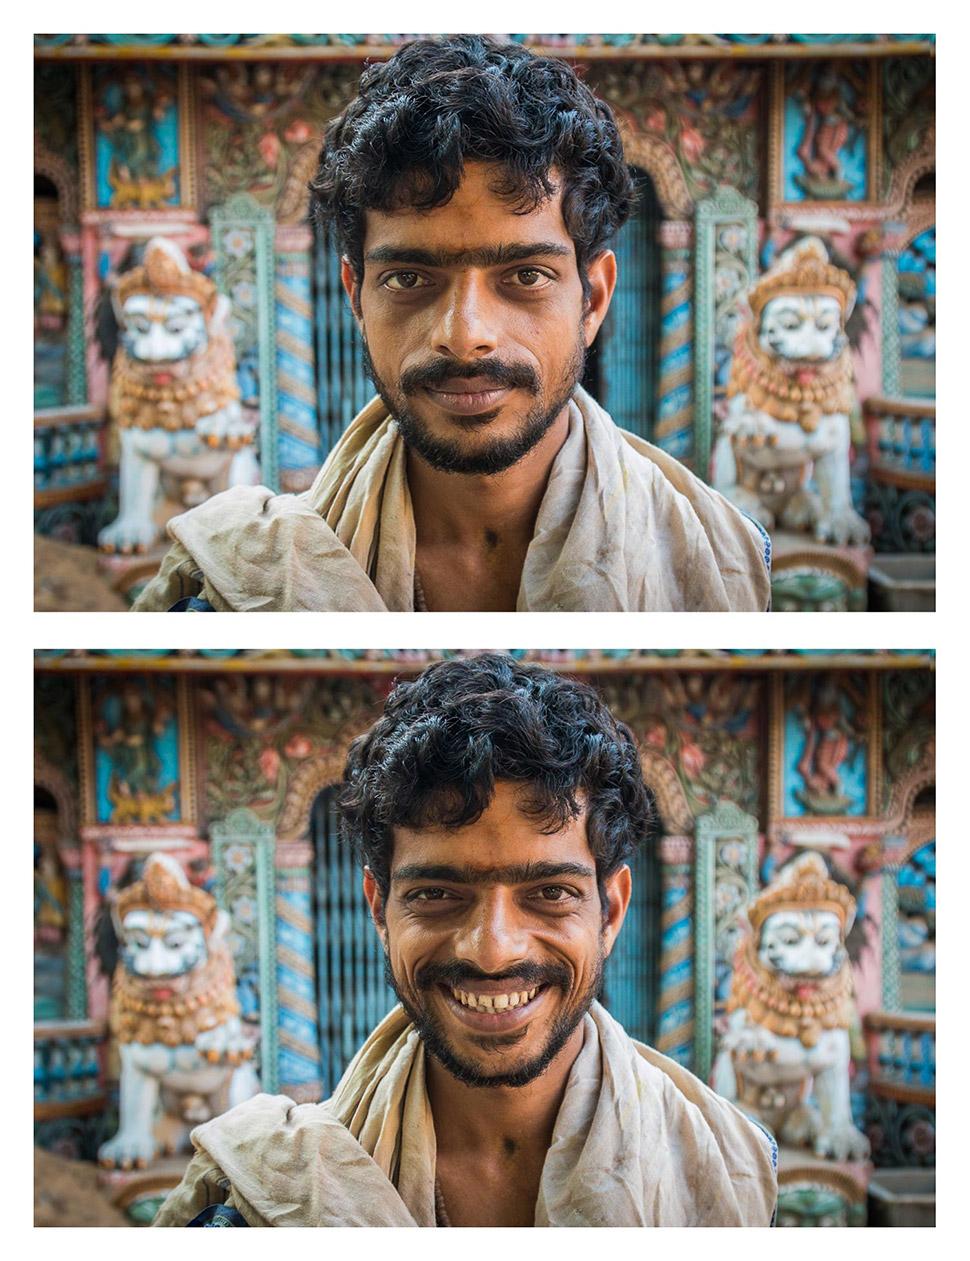 Сила улыбки и фотографии незнакомцев